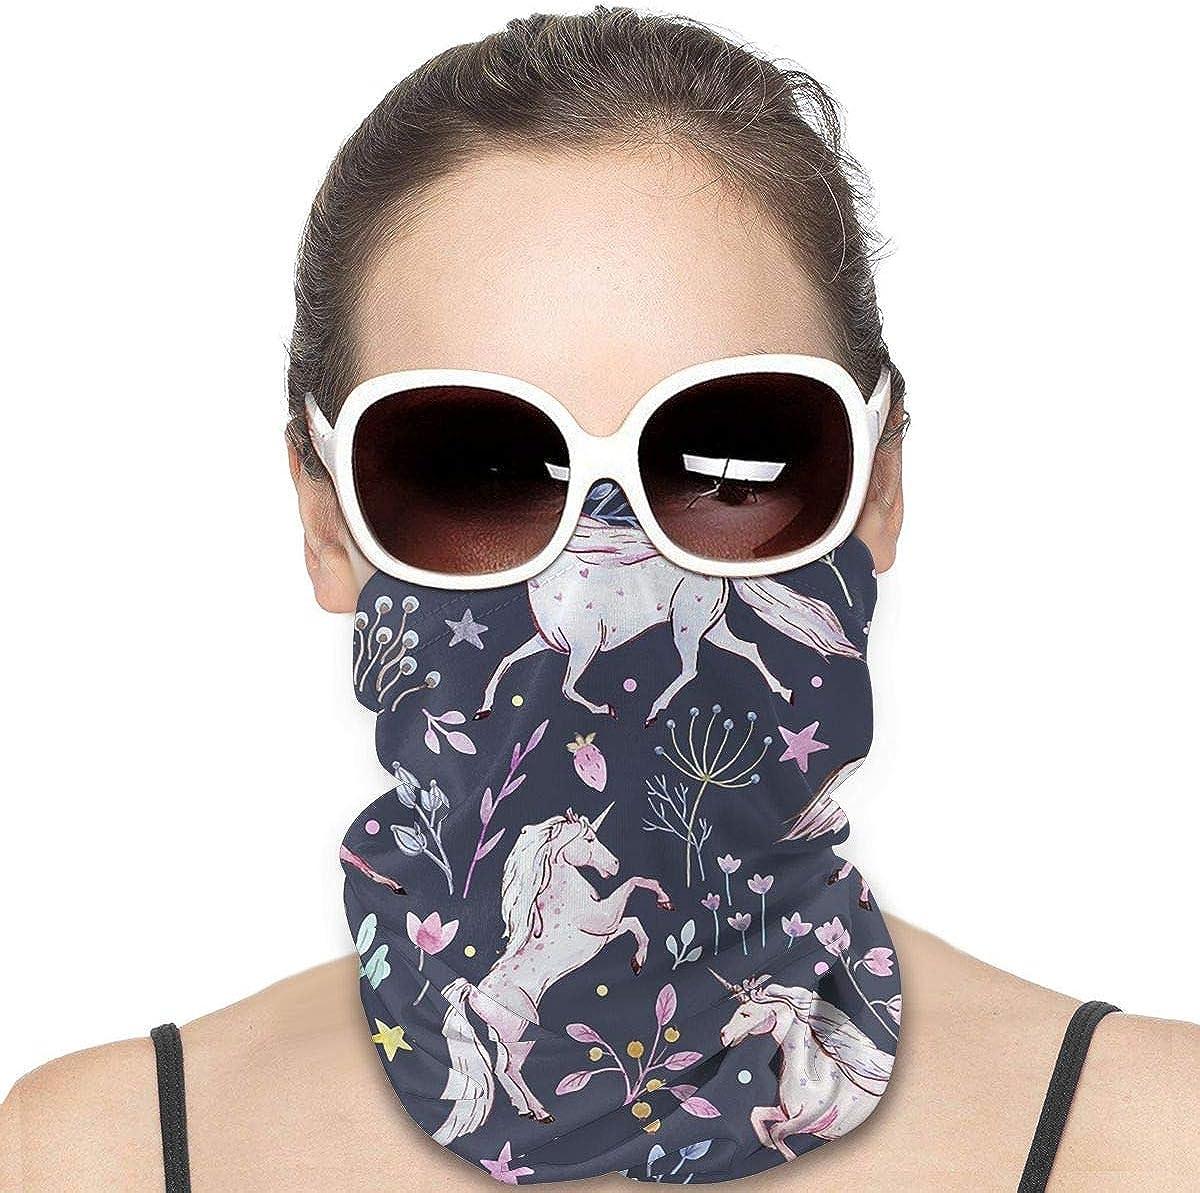 KiuLoam Women Bandanas Face Mask, Dark Unicorn Neck Gaiter Mask Headband for Men Face Scarf Dust, Outdoors, Sports